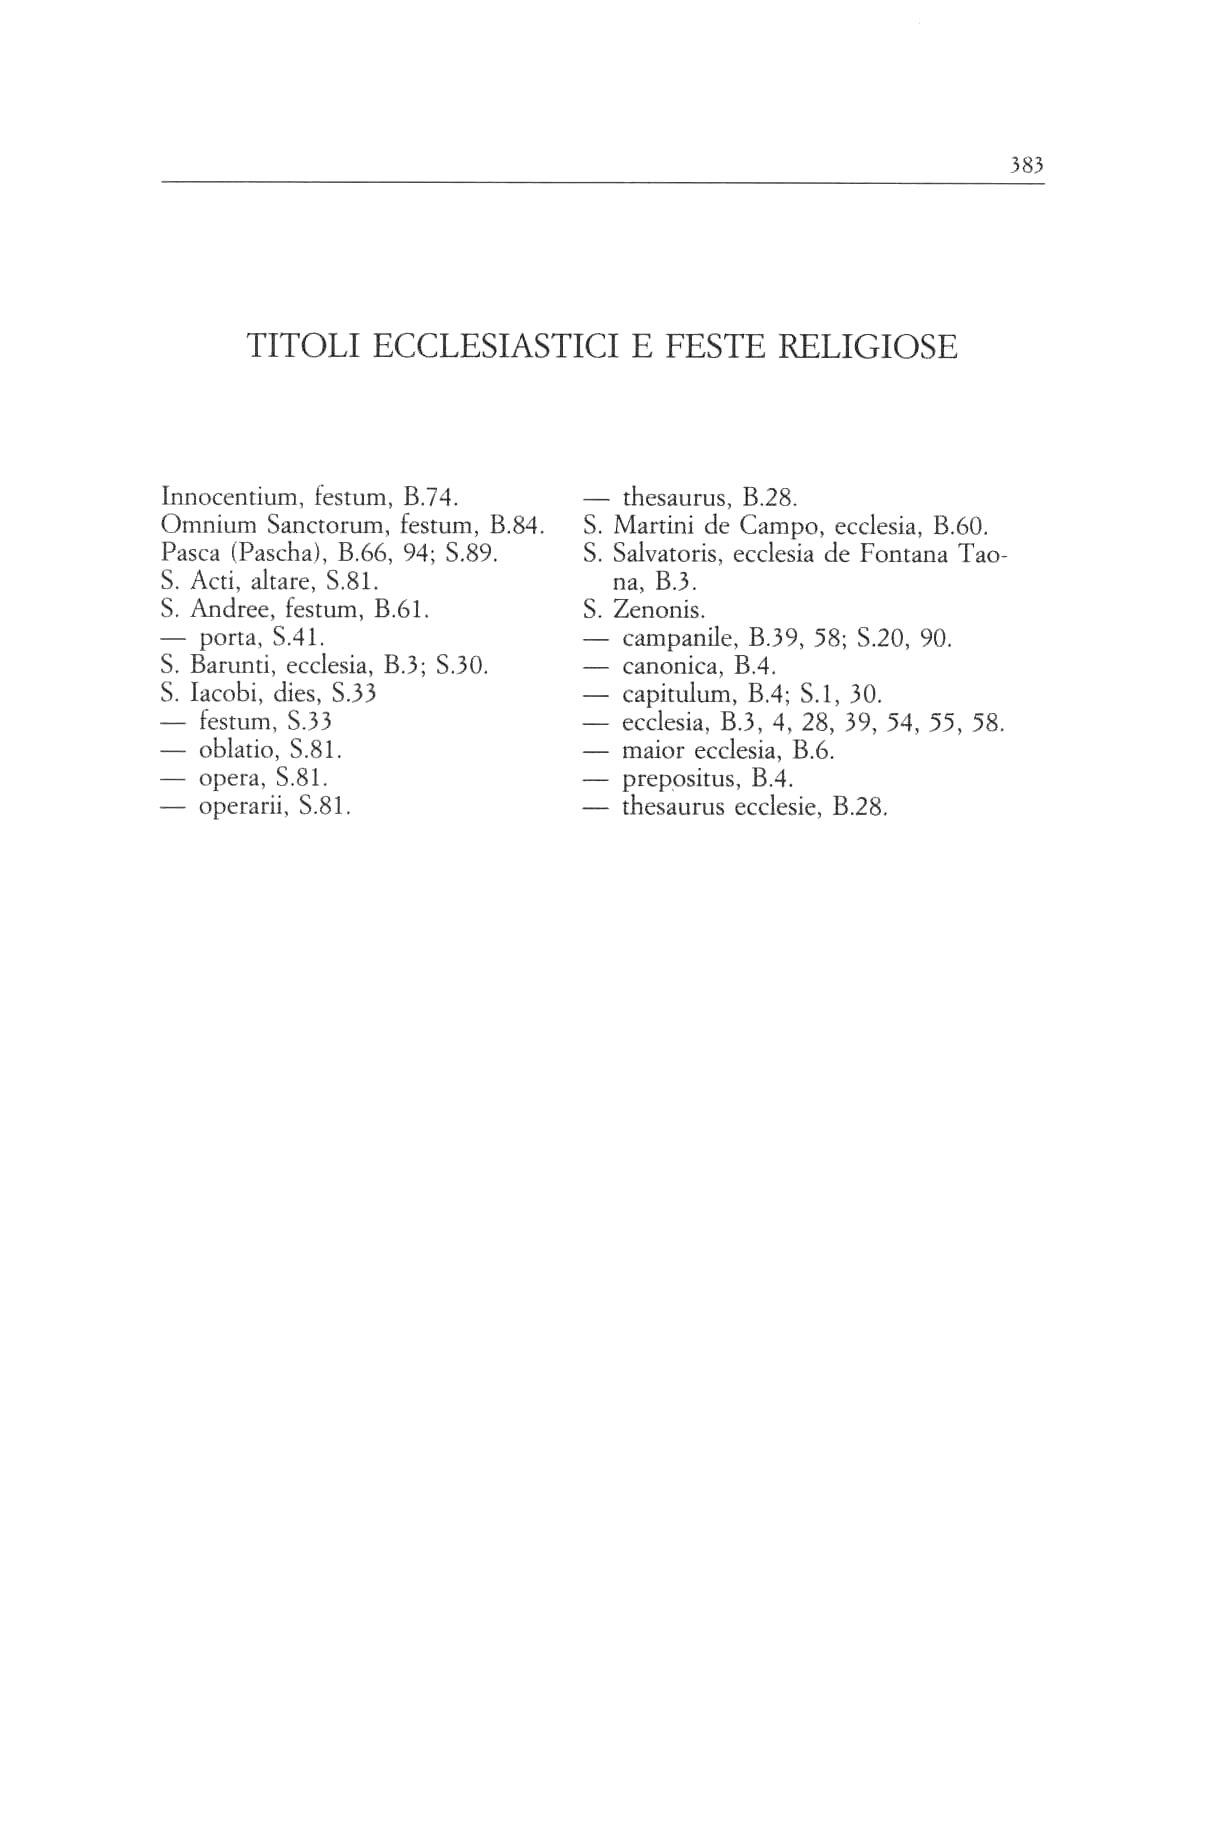 statuti pistoiesi del sec.XII 0383.jpg